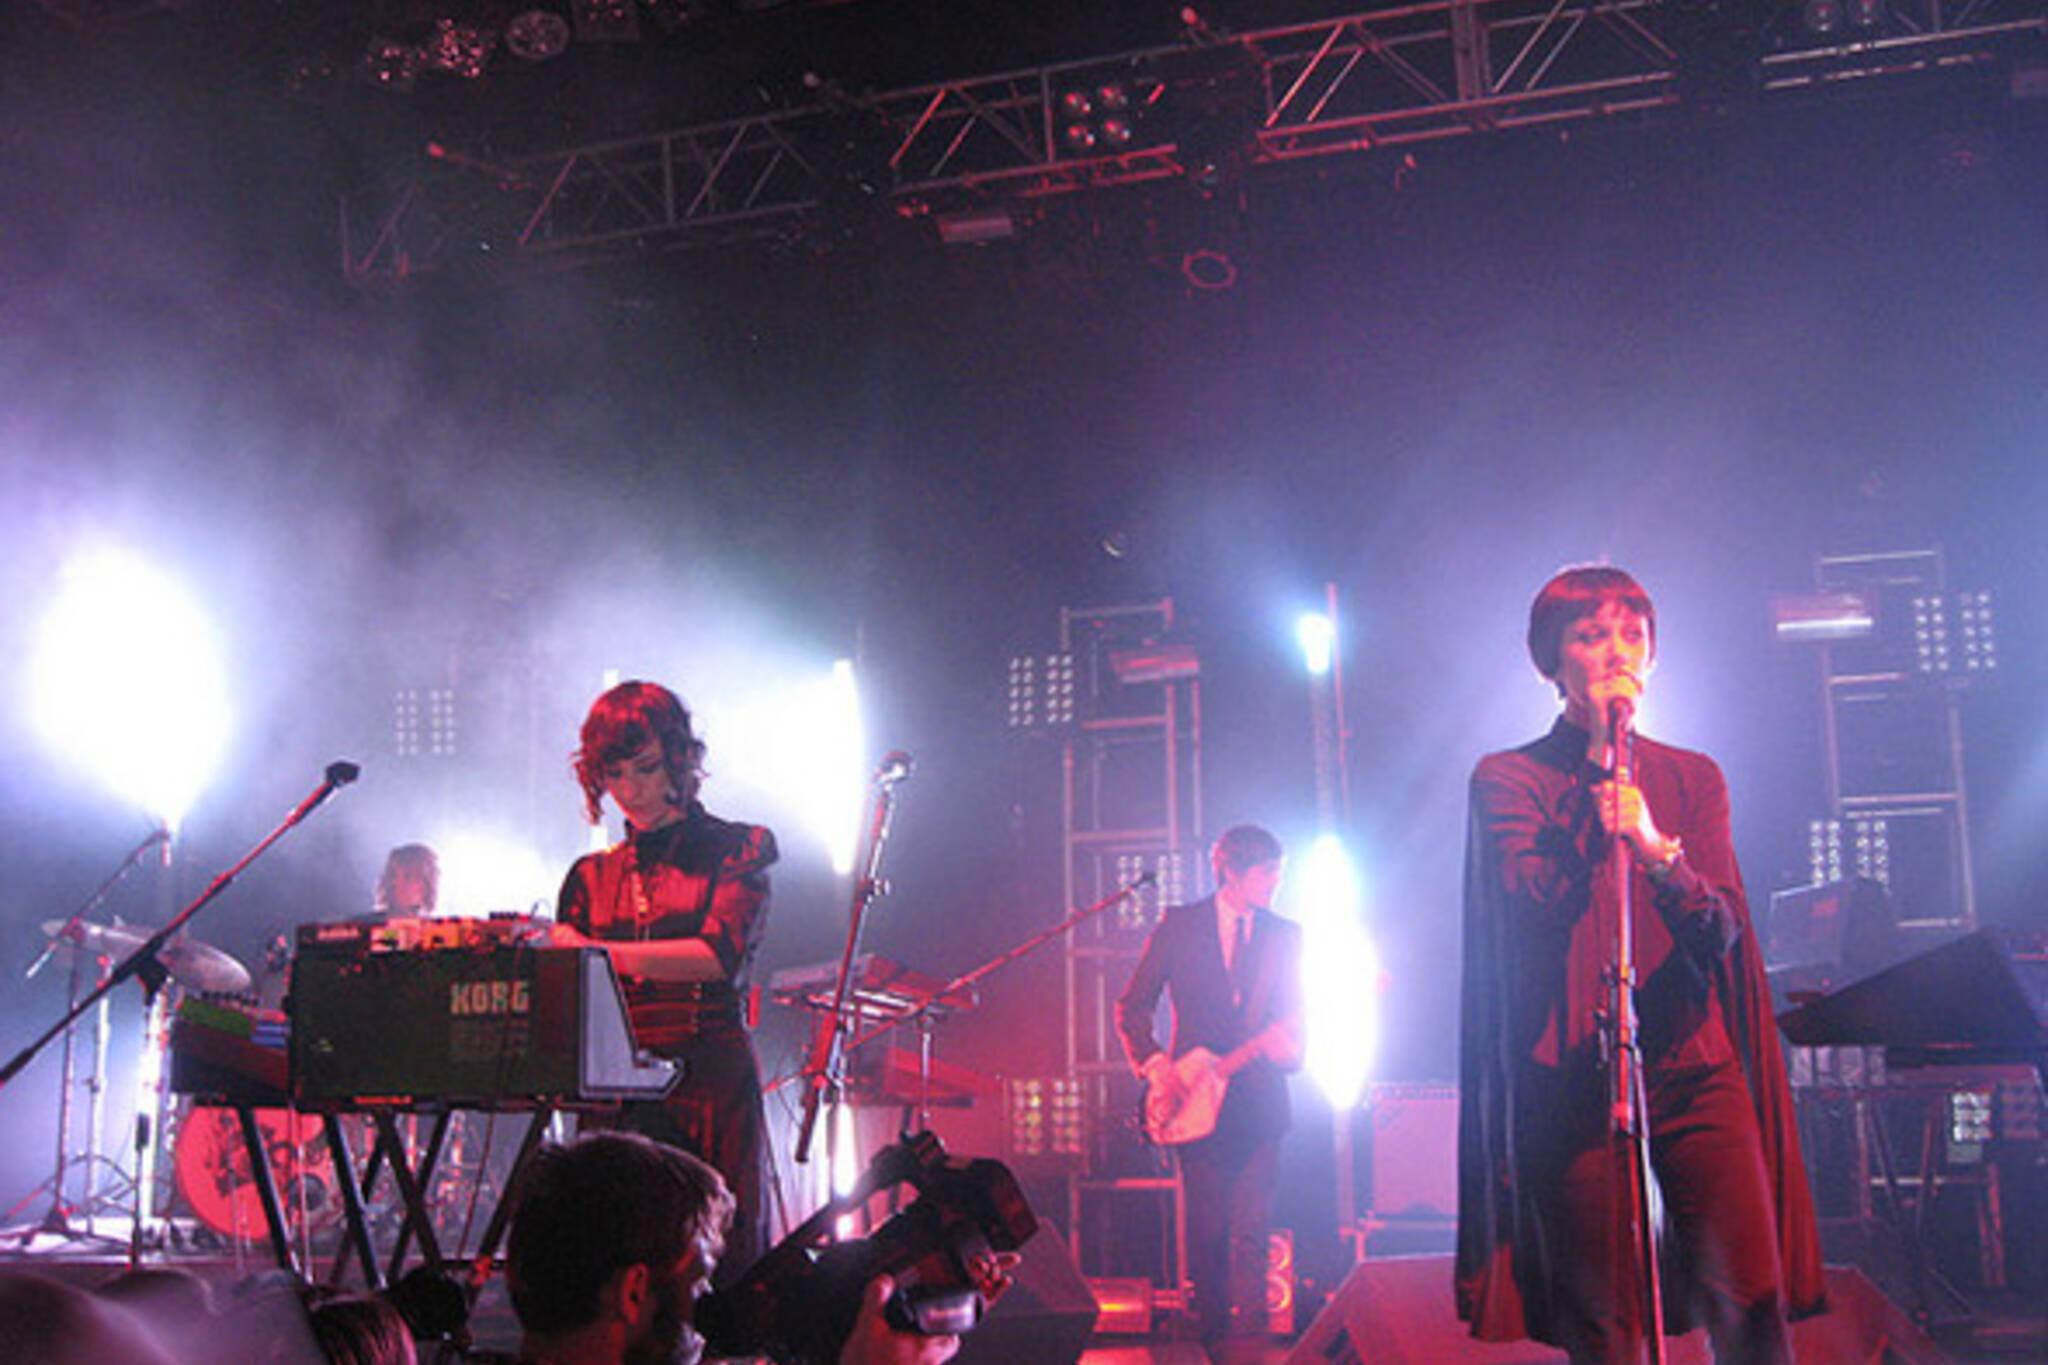 Toronto hot ticket concerts